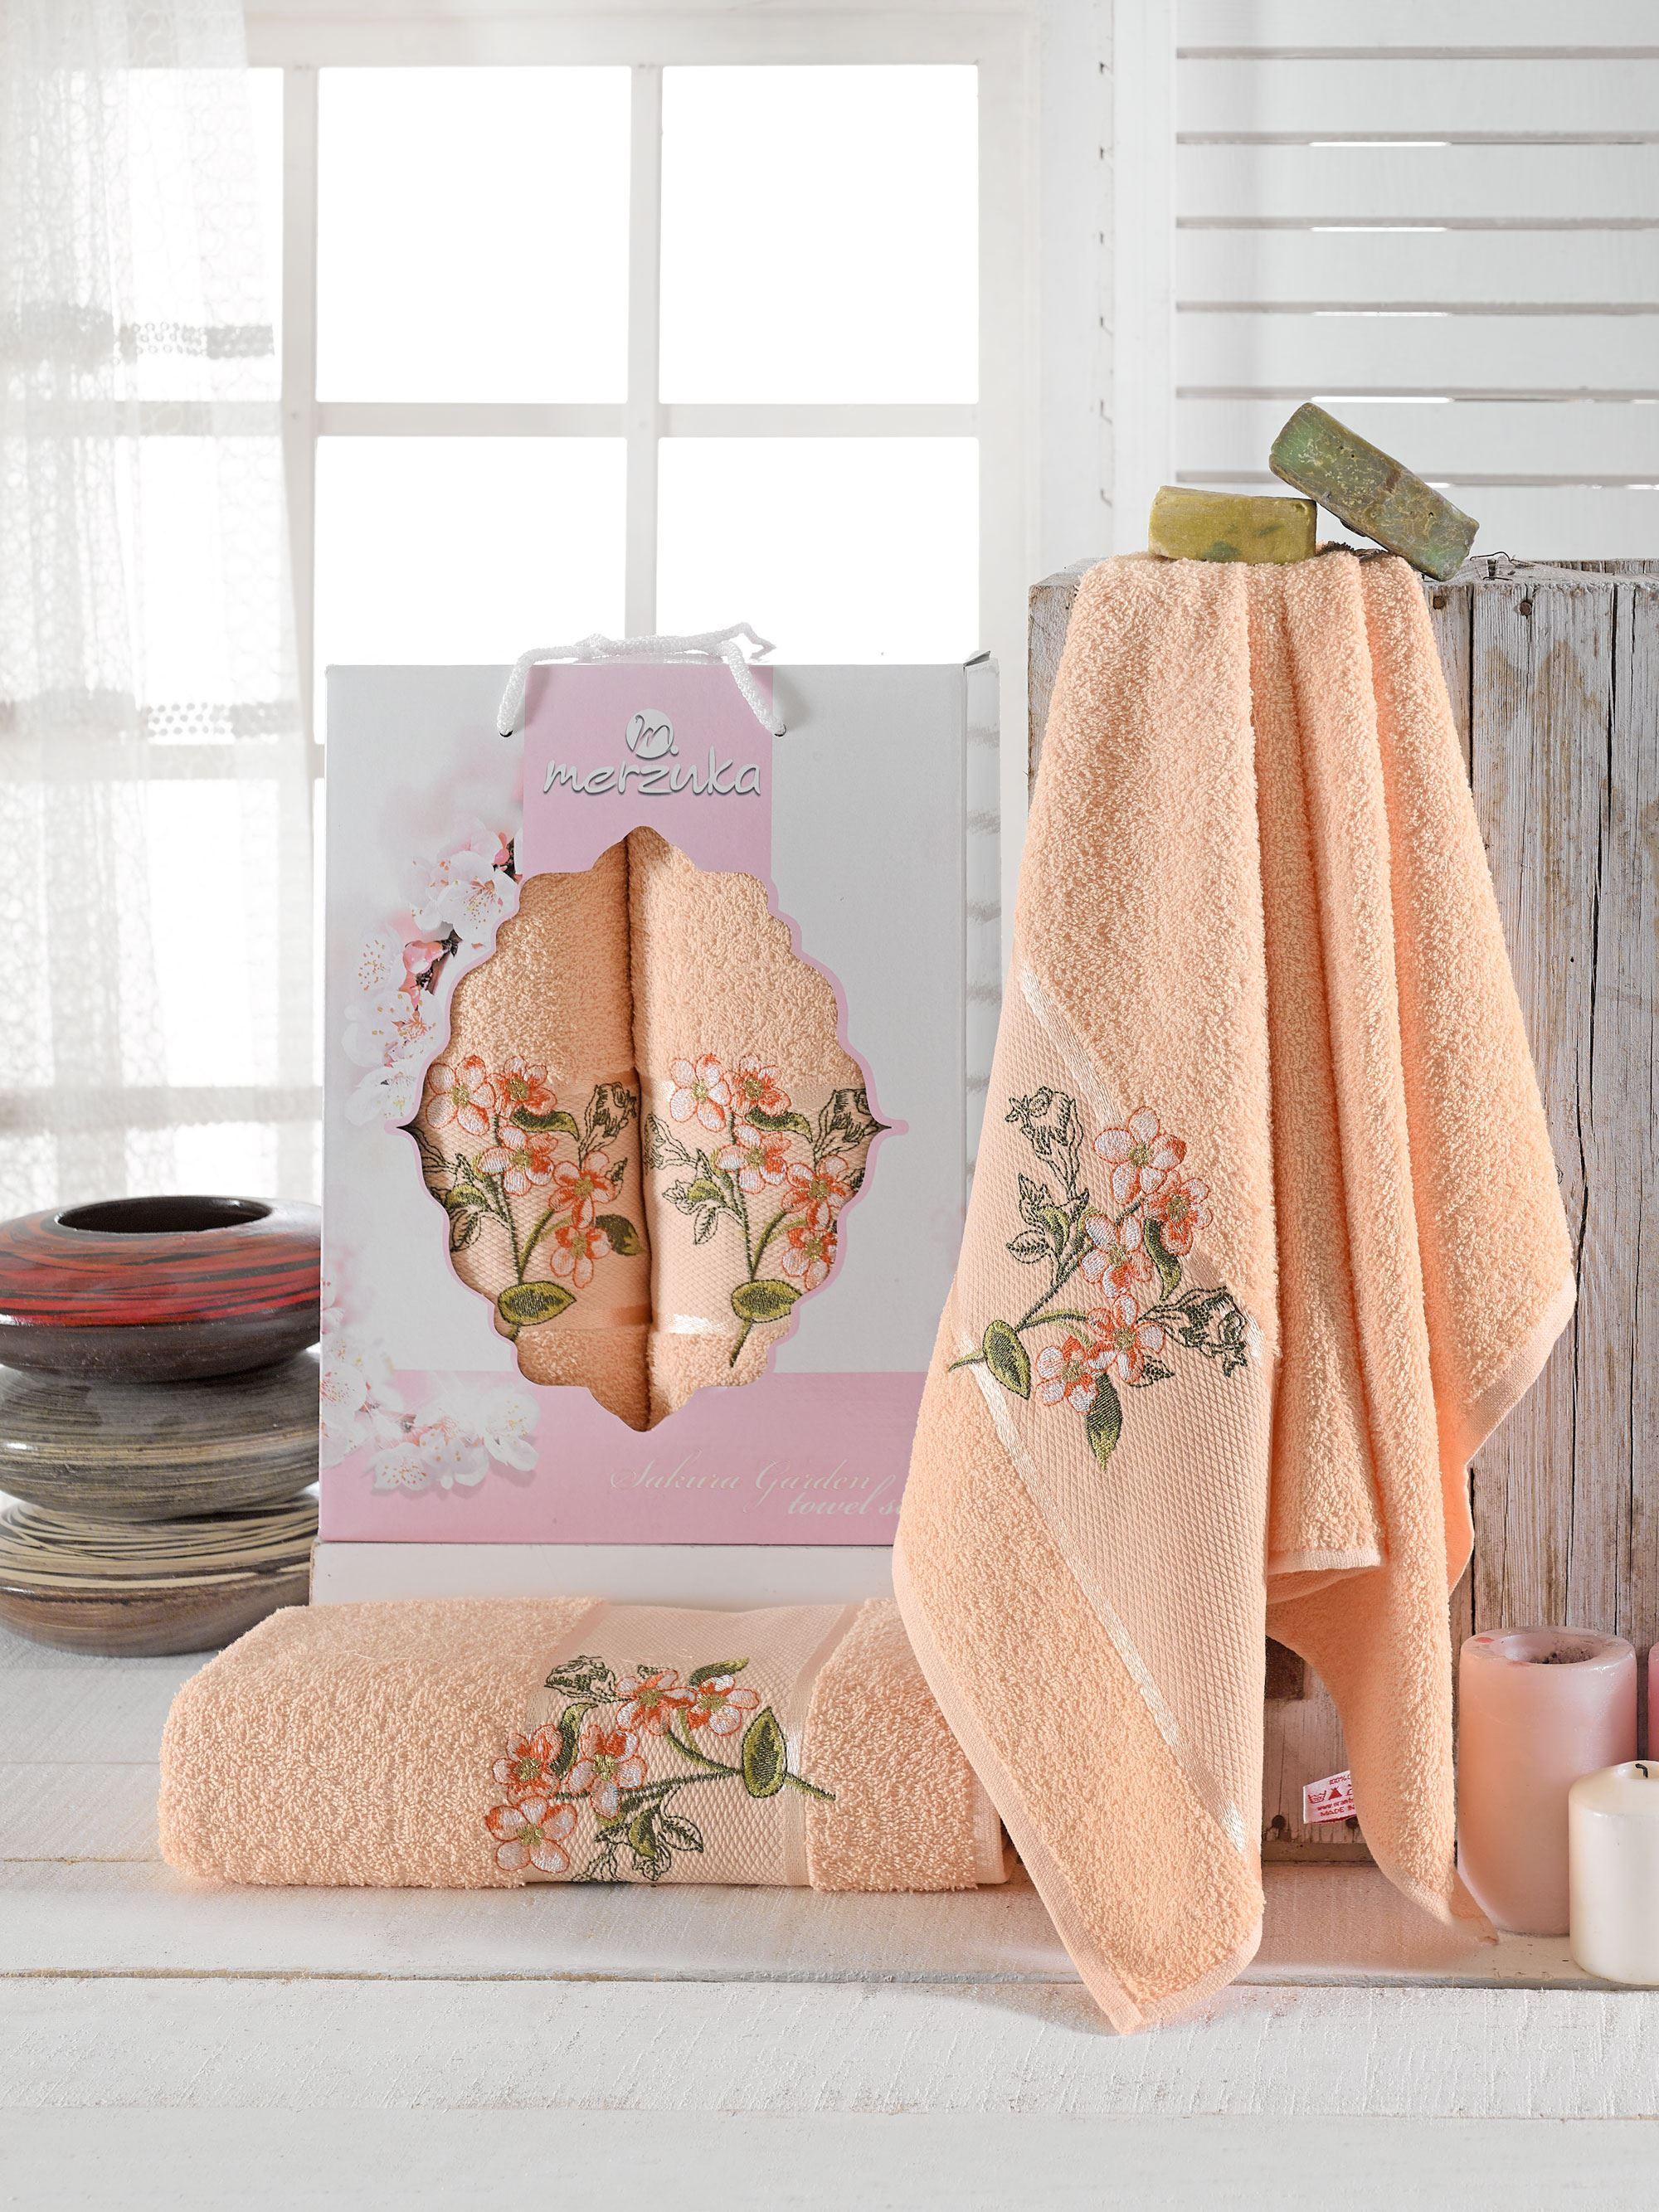 Полотенца Oran Merzuka Полотенце Sakura Garden Цвет: Оранжевый (50х80 см,70х130 см) оранжевый prime м 50х90 70х130 в коробке набор полотенец фиеста